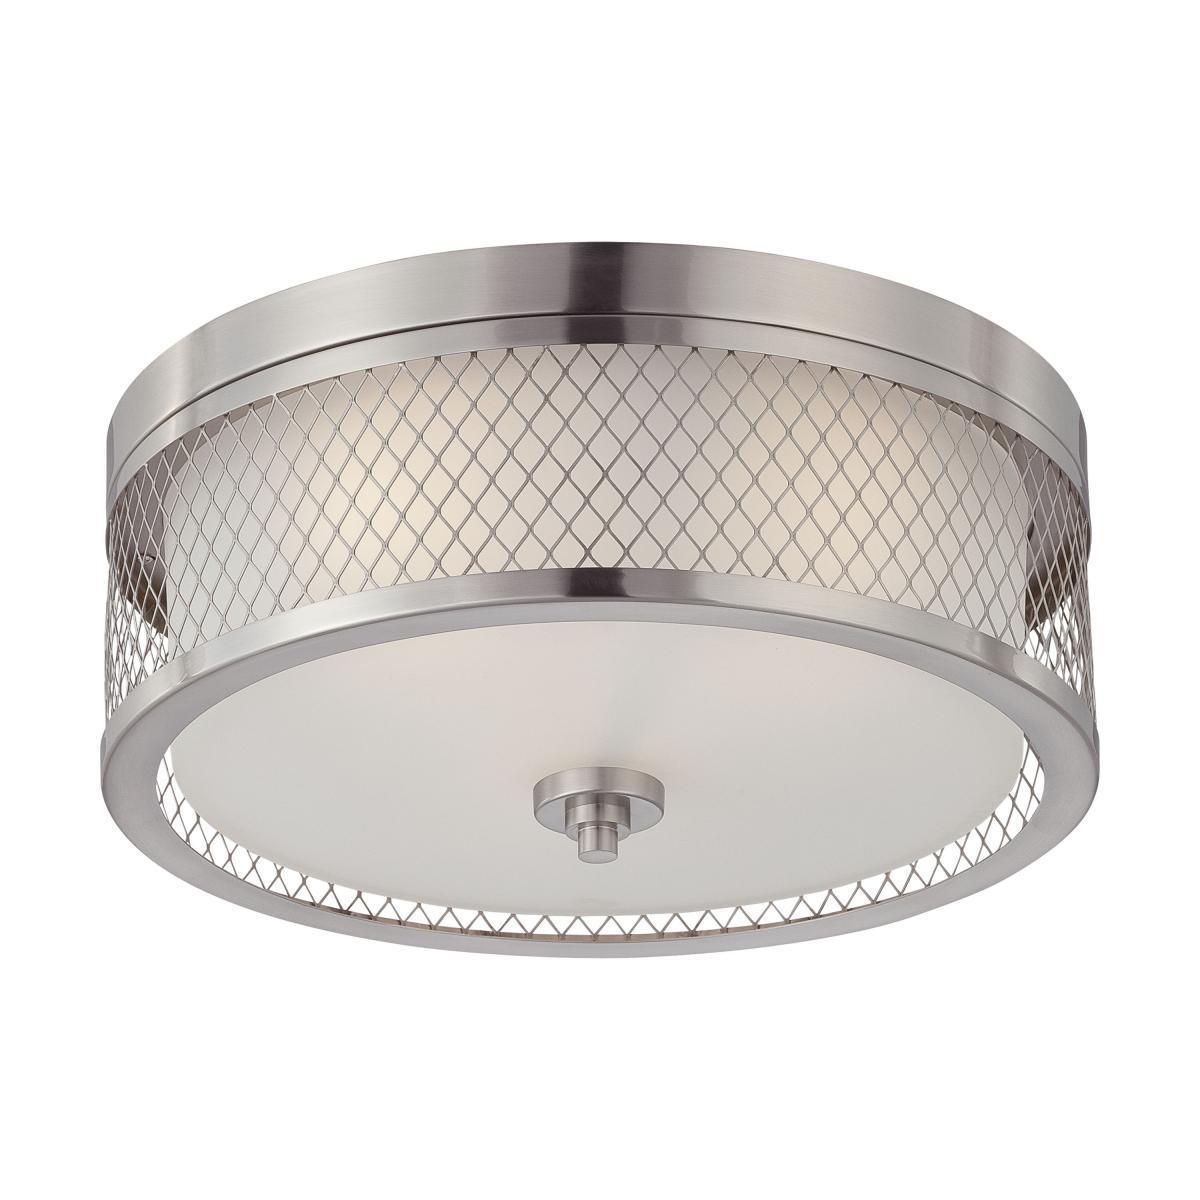 60-4691 FUSION 3 LIGHT FLUSH DOME